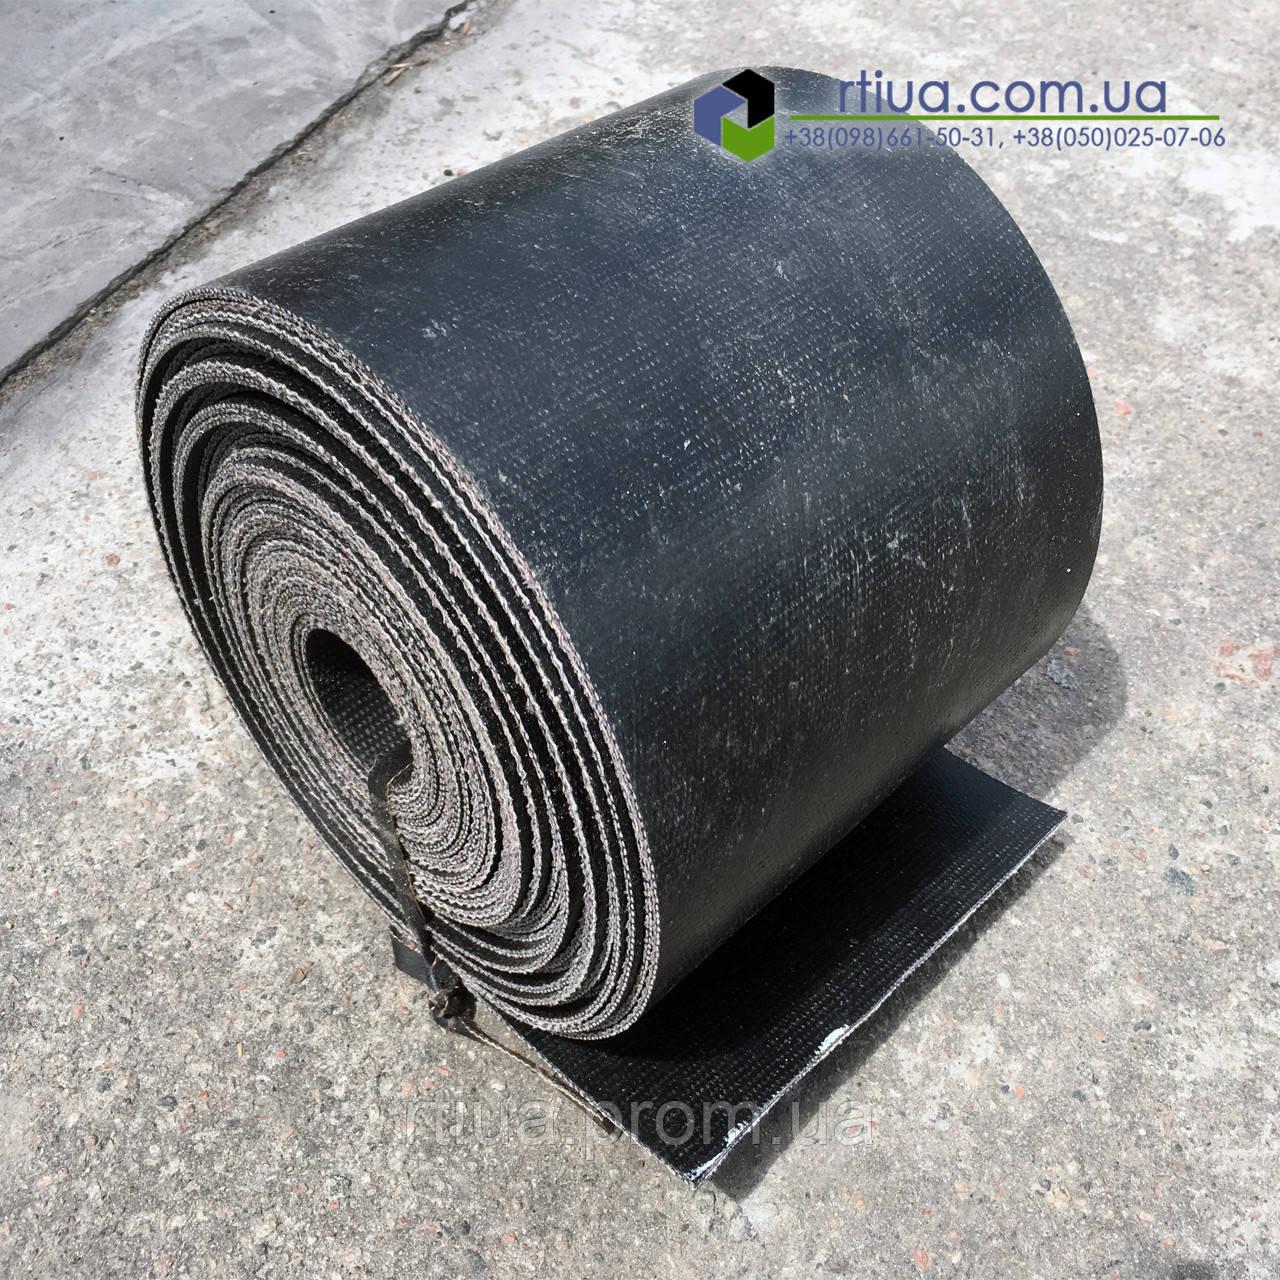 Транспортерная лента ТК-200, 650х5 - 5/2 (12 мм)